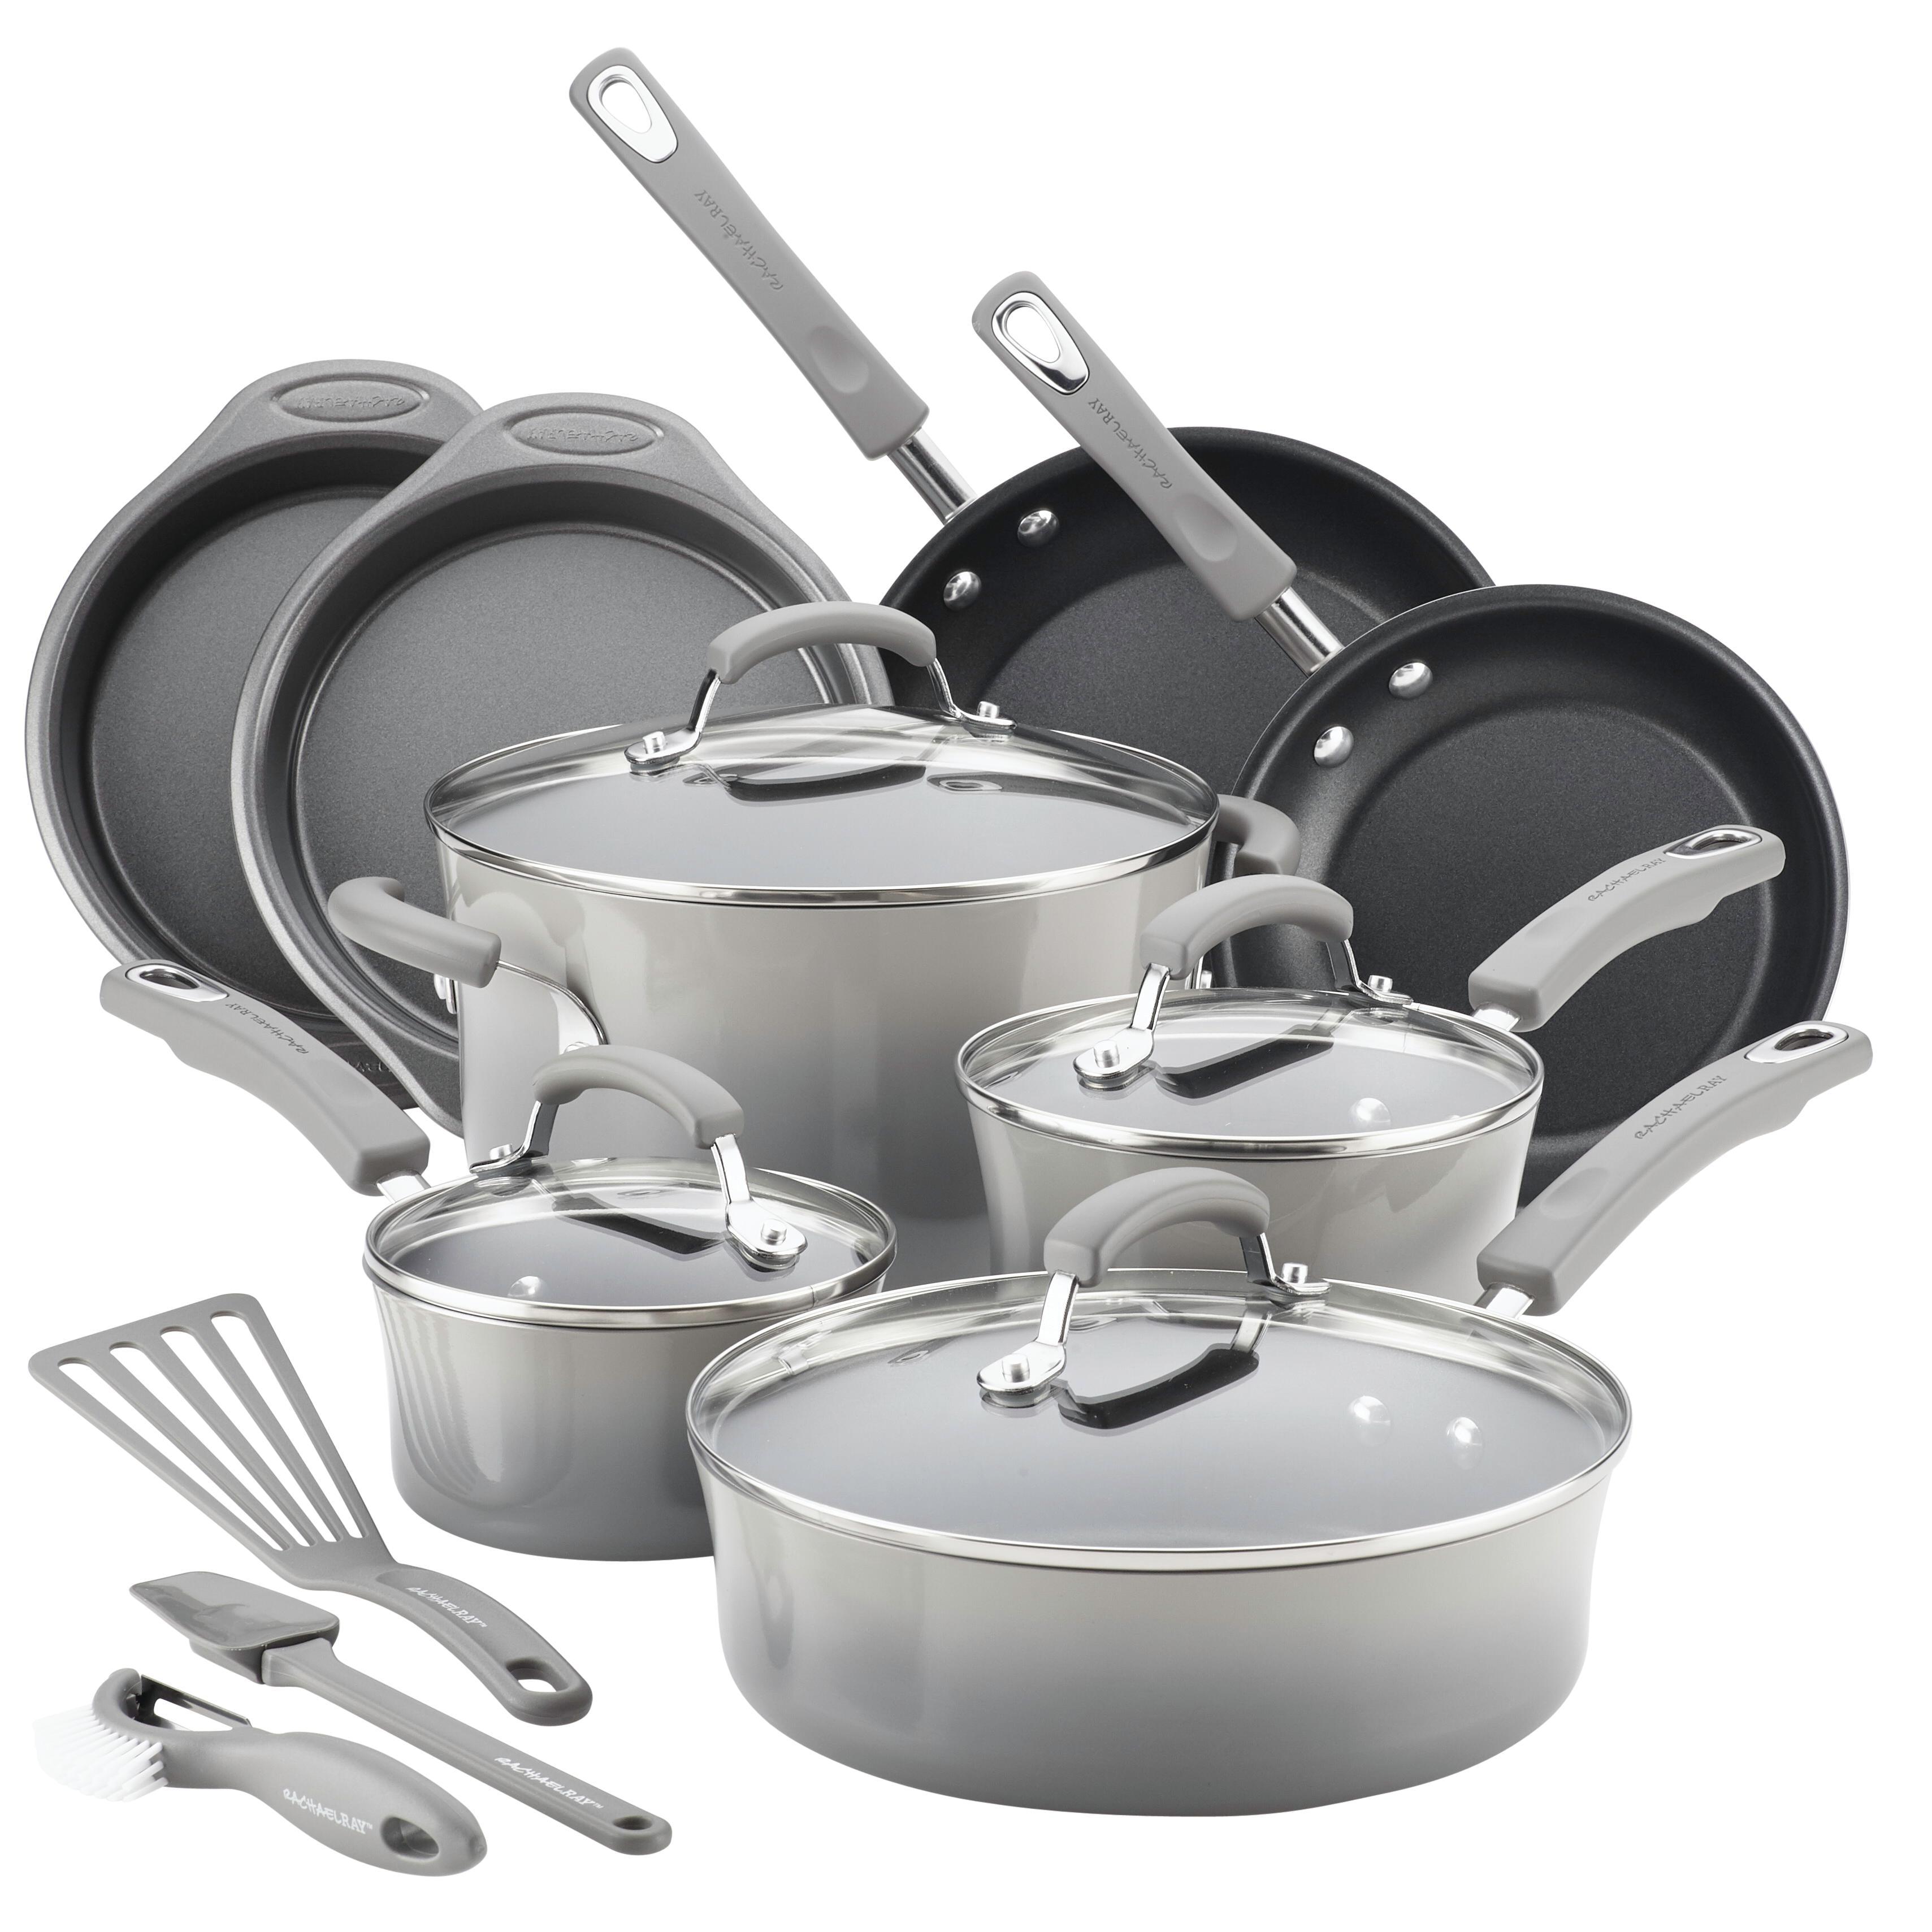 Rachael Ray 15 Piece Hard Enamel Aluminum Nonstick Cookware Set, Gray